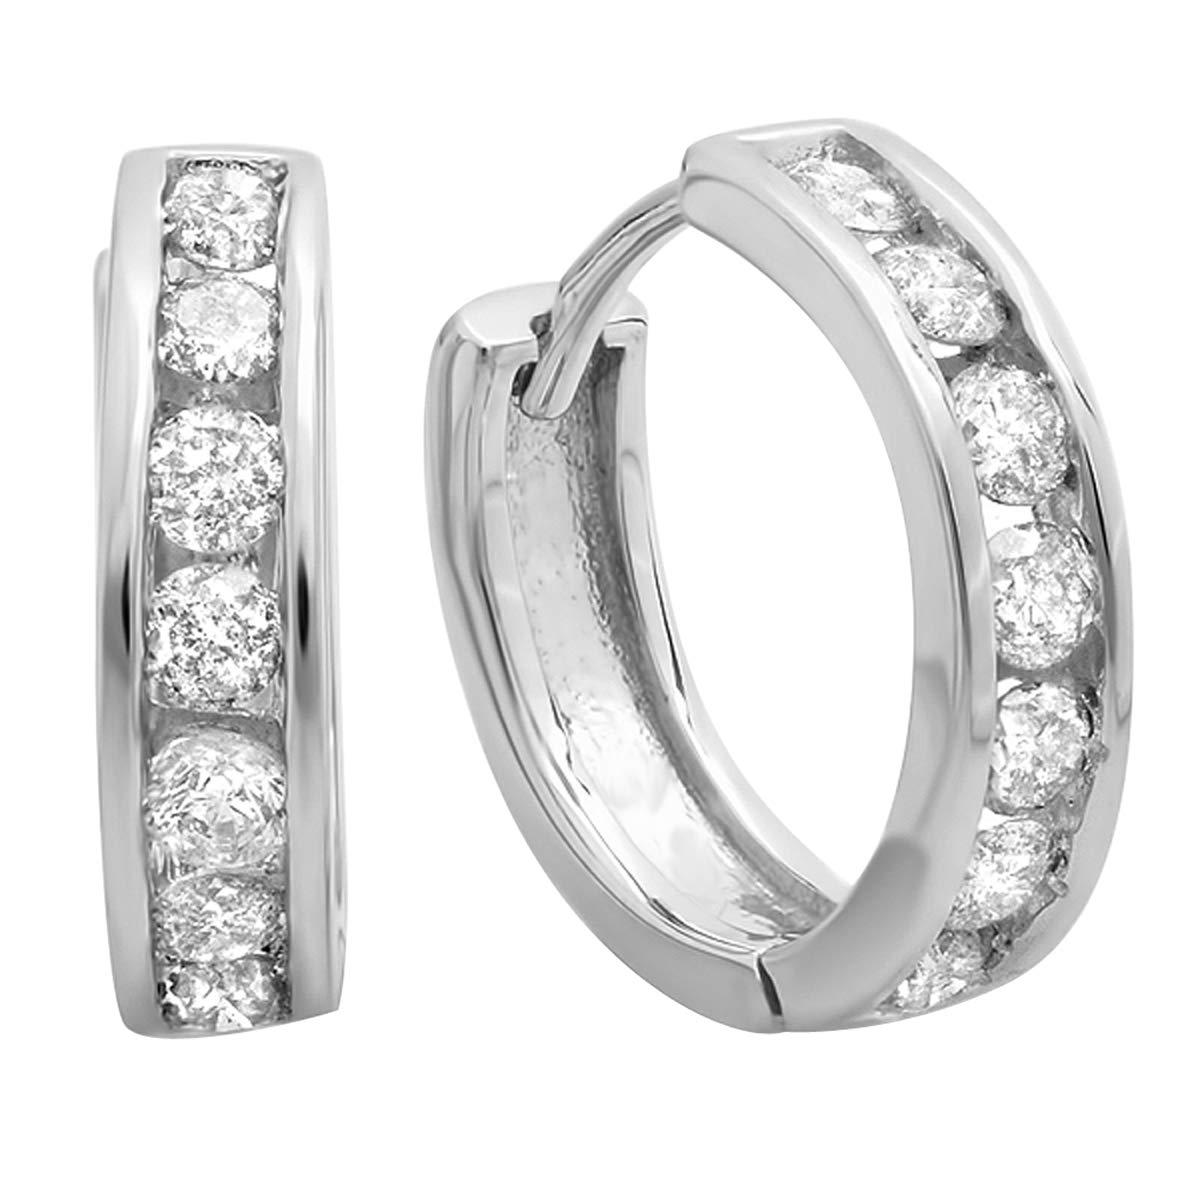 Dazzlingrock Collection 0.50 Carat (ctw) 10K Round Diamond Ladies Mens Unisex Huggie Hoop Earrings 1/2 CT, White Gold by Dazzlingrock Collection (Image #1)